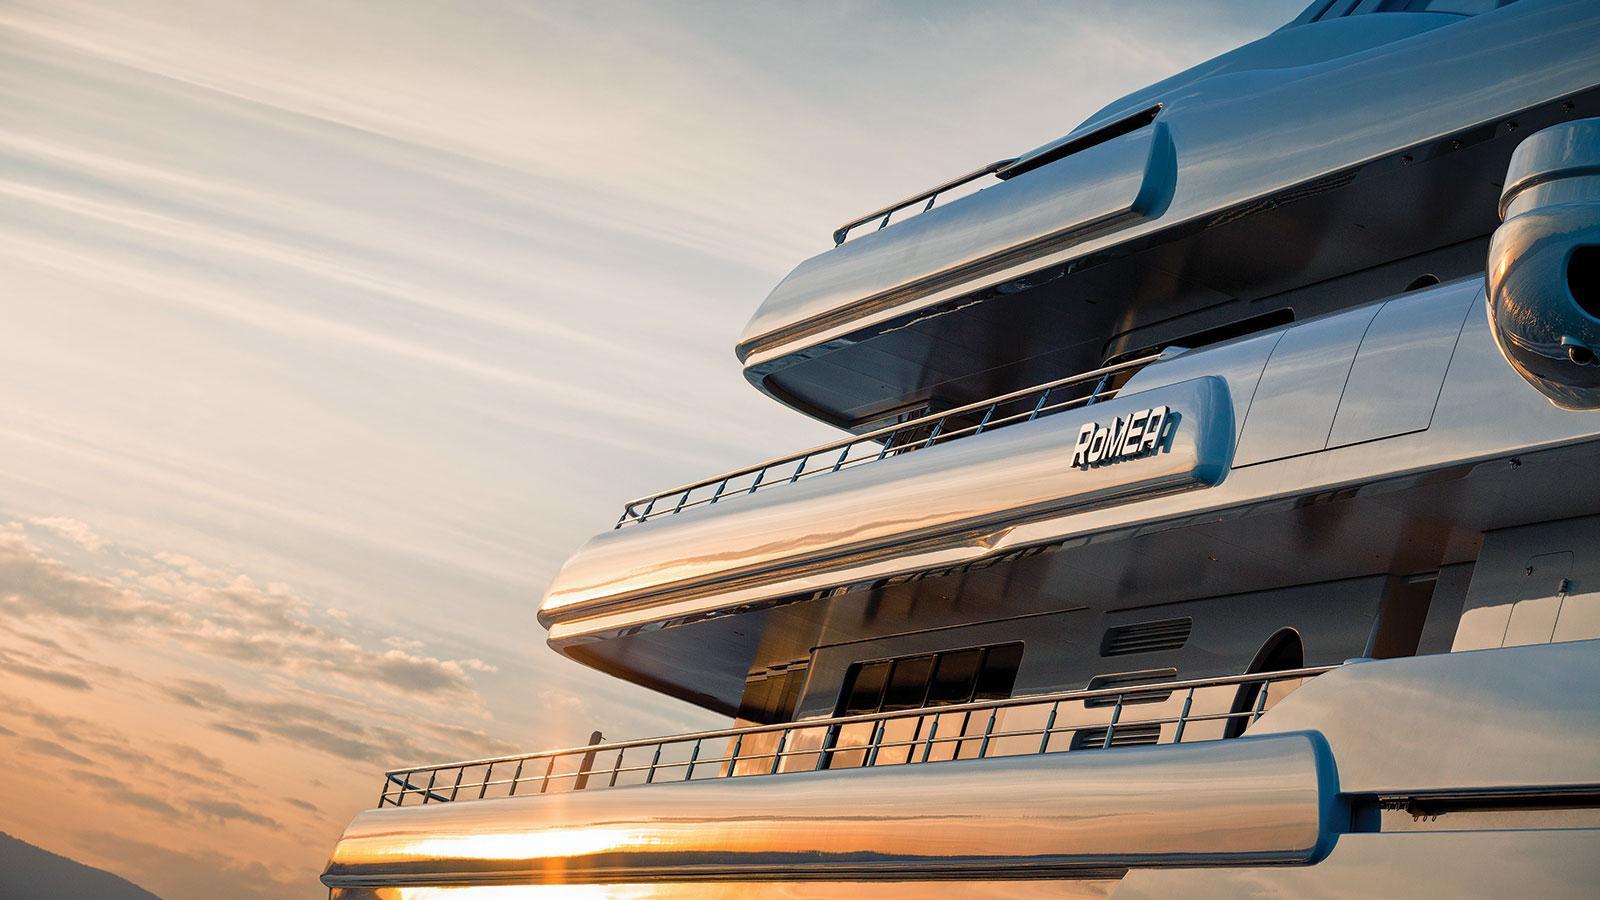 romea-motor-yacht-abeking-rasmussen-2015-82m-exterior-detail